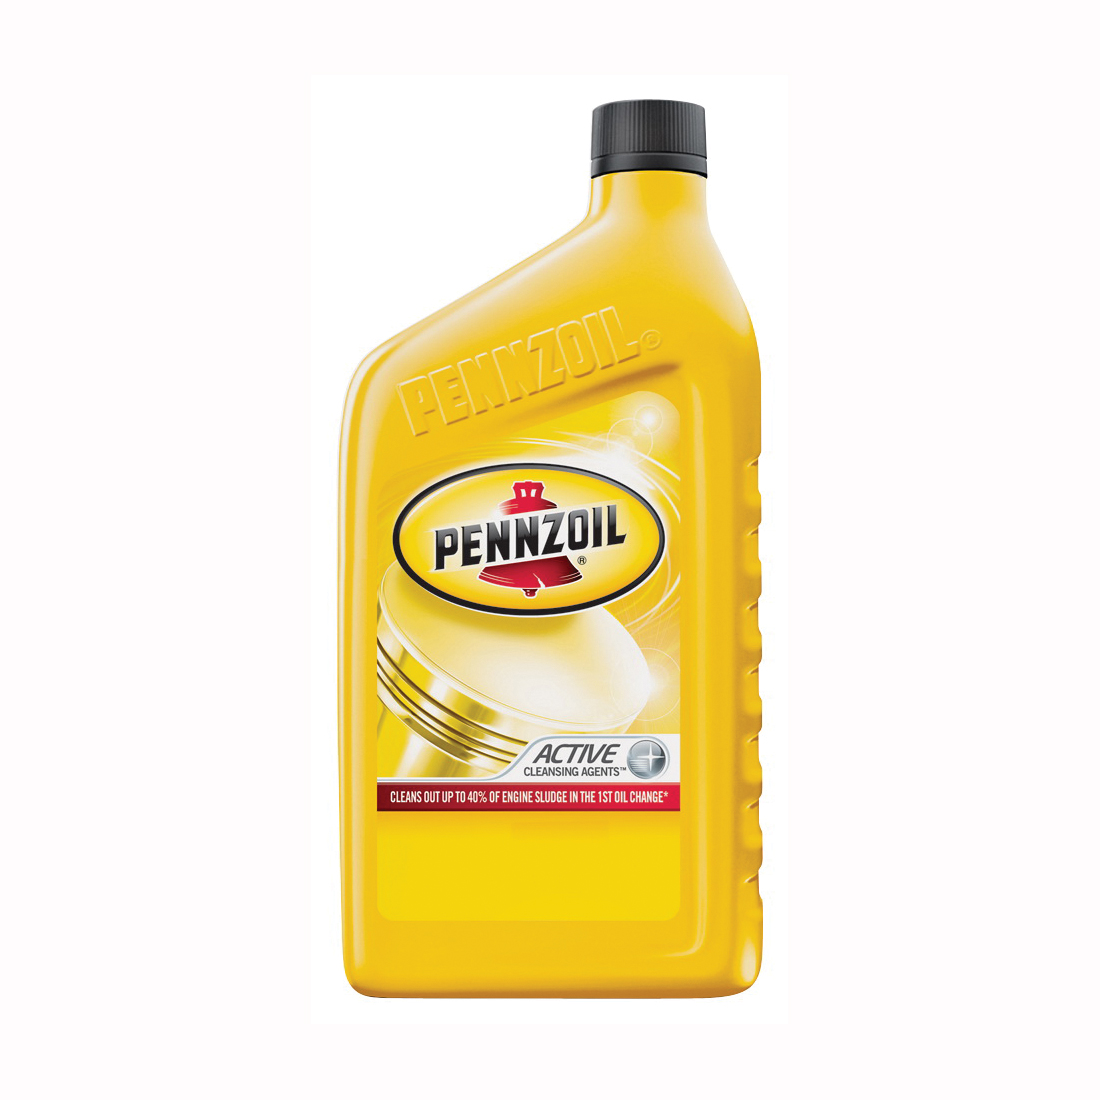 Picture of Pennzoil 550035091/3609 Motor Oil, 5W-30, 1 qt Package, Bottle